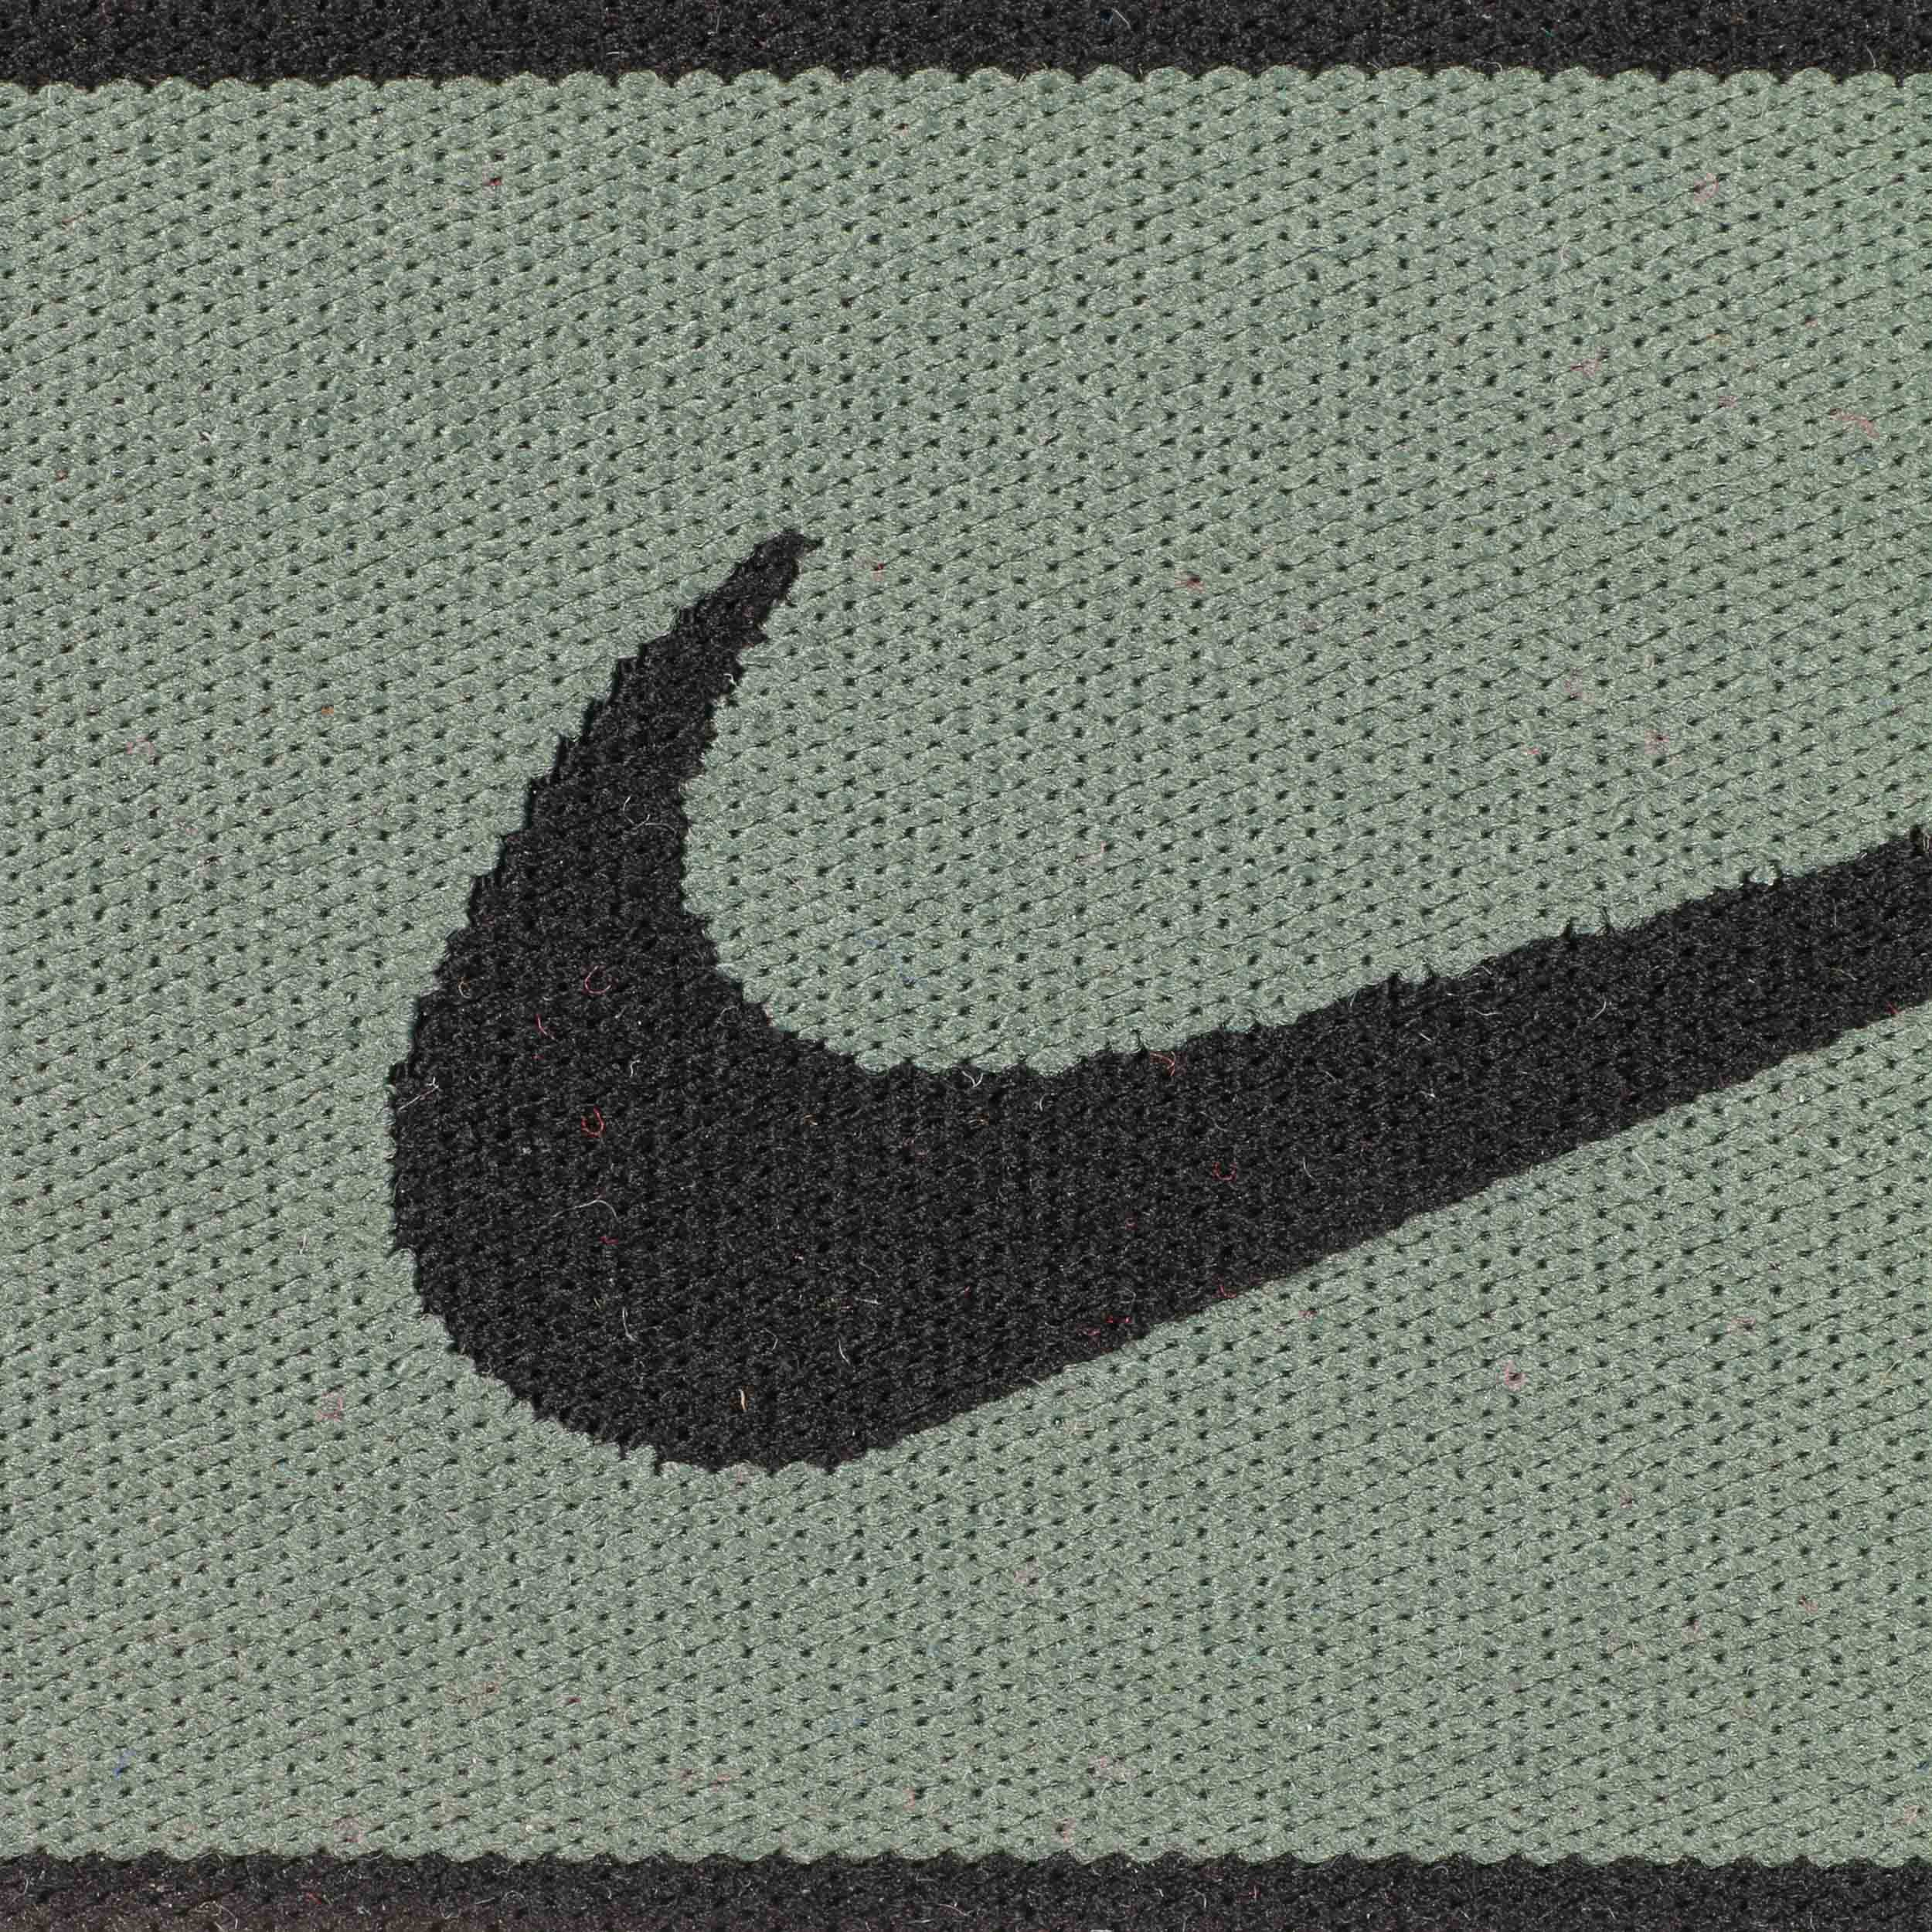 114d006151e6 ... Pro Swoosh Headband 2.0 by Nike - green 2 ...